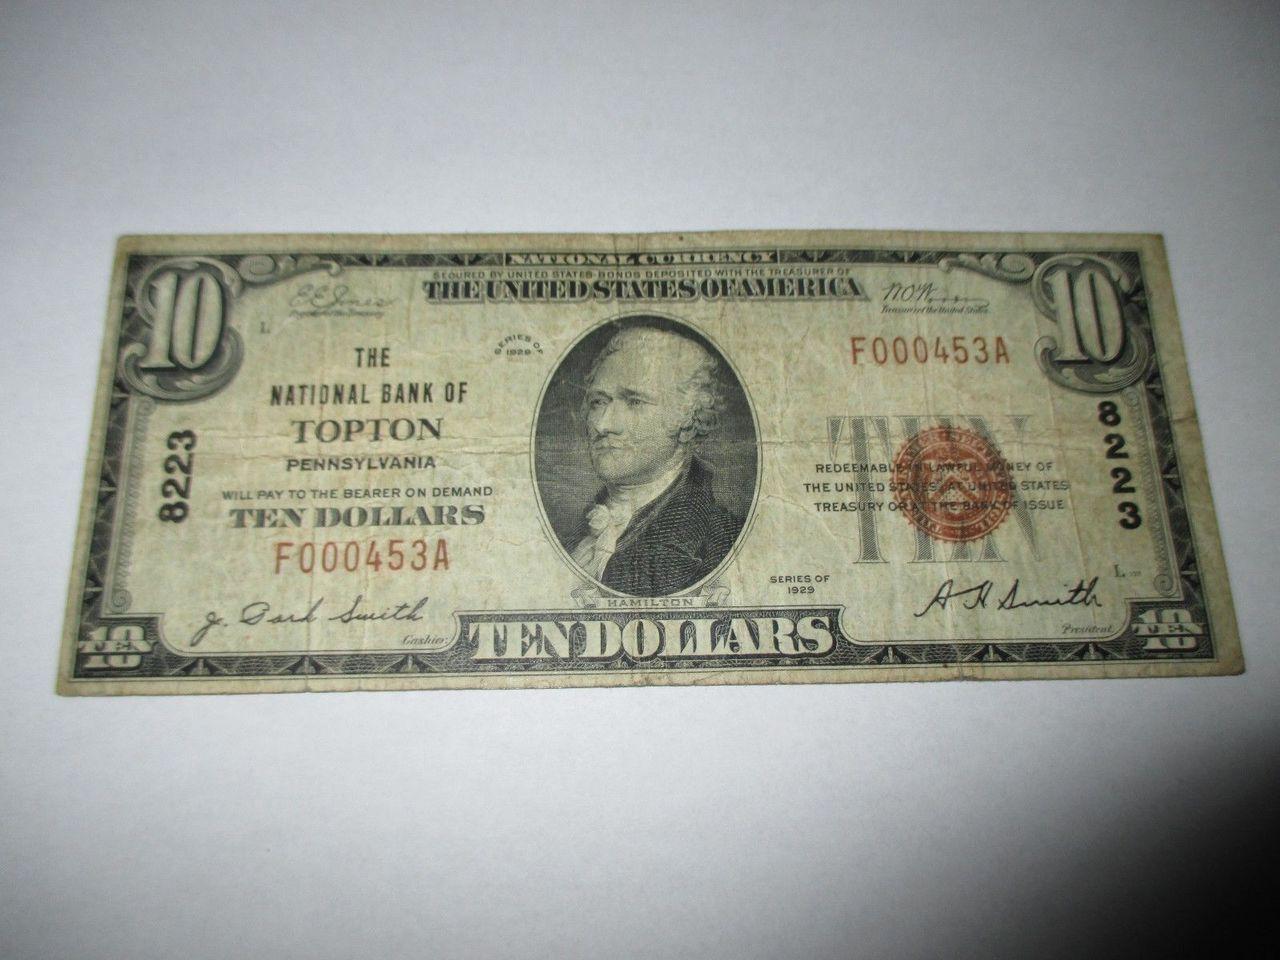 10 1929 topton pennsylvania pa national currency bank